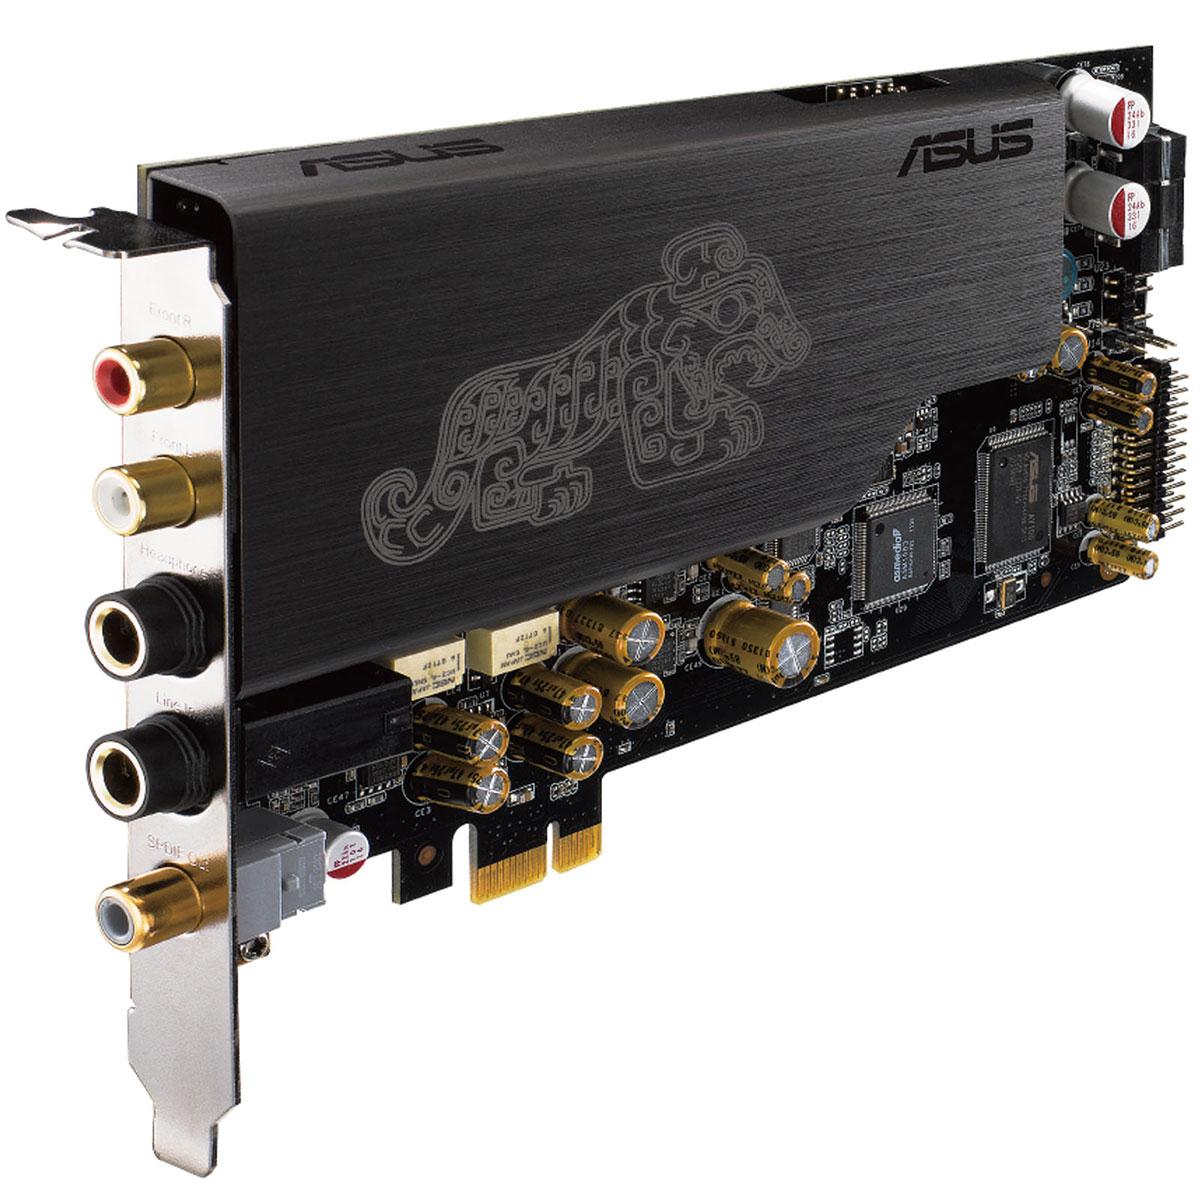 Xonar Essence STX II 7.1 PCI-E (90YA00NN-M0UA00) - Achat / Vente Carte son sur Picata.fr - 1